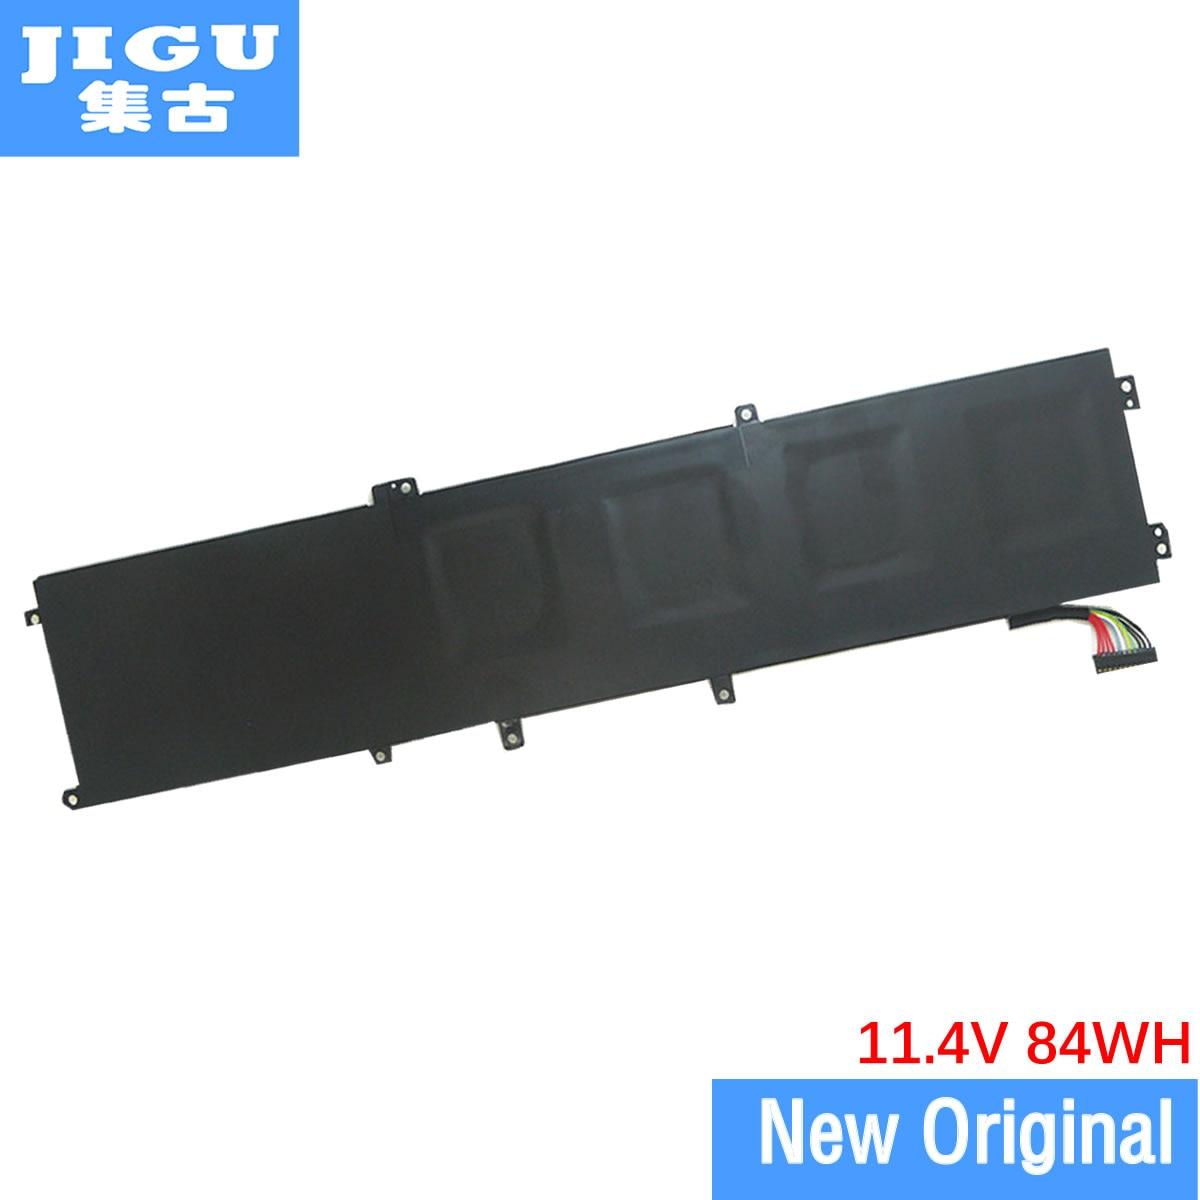 JIGU 11.4V 84WH original laptop Battery 1P6KD 4GVGH RRCGW for DELL for Precision 5510 XPS 15 9550 XPS15 9550 84wh new laptop battery for dell precision 3510 wj5r2 4f5yv